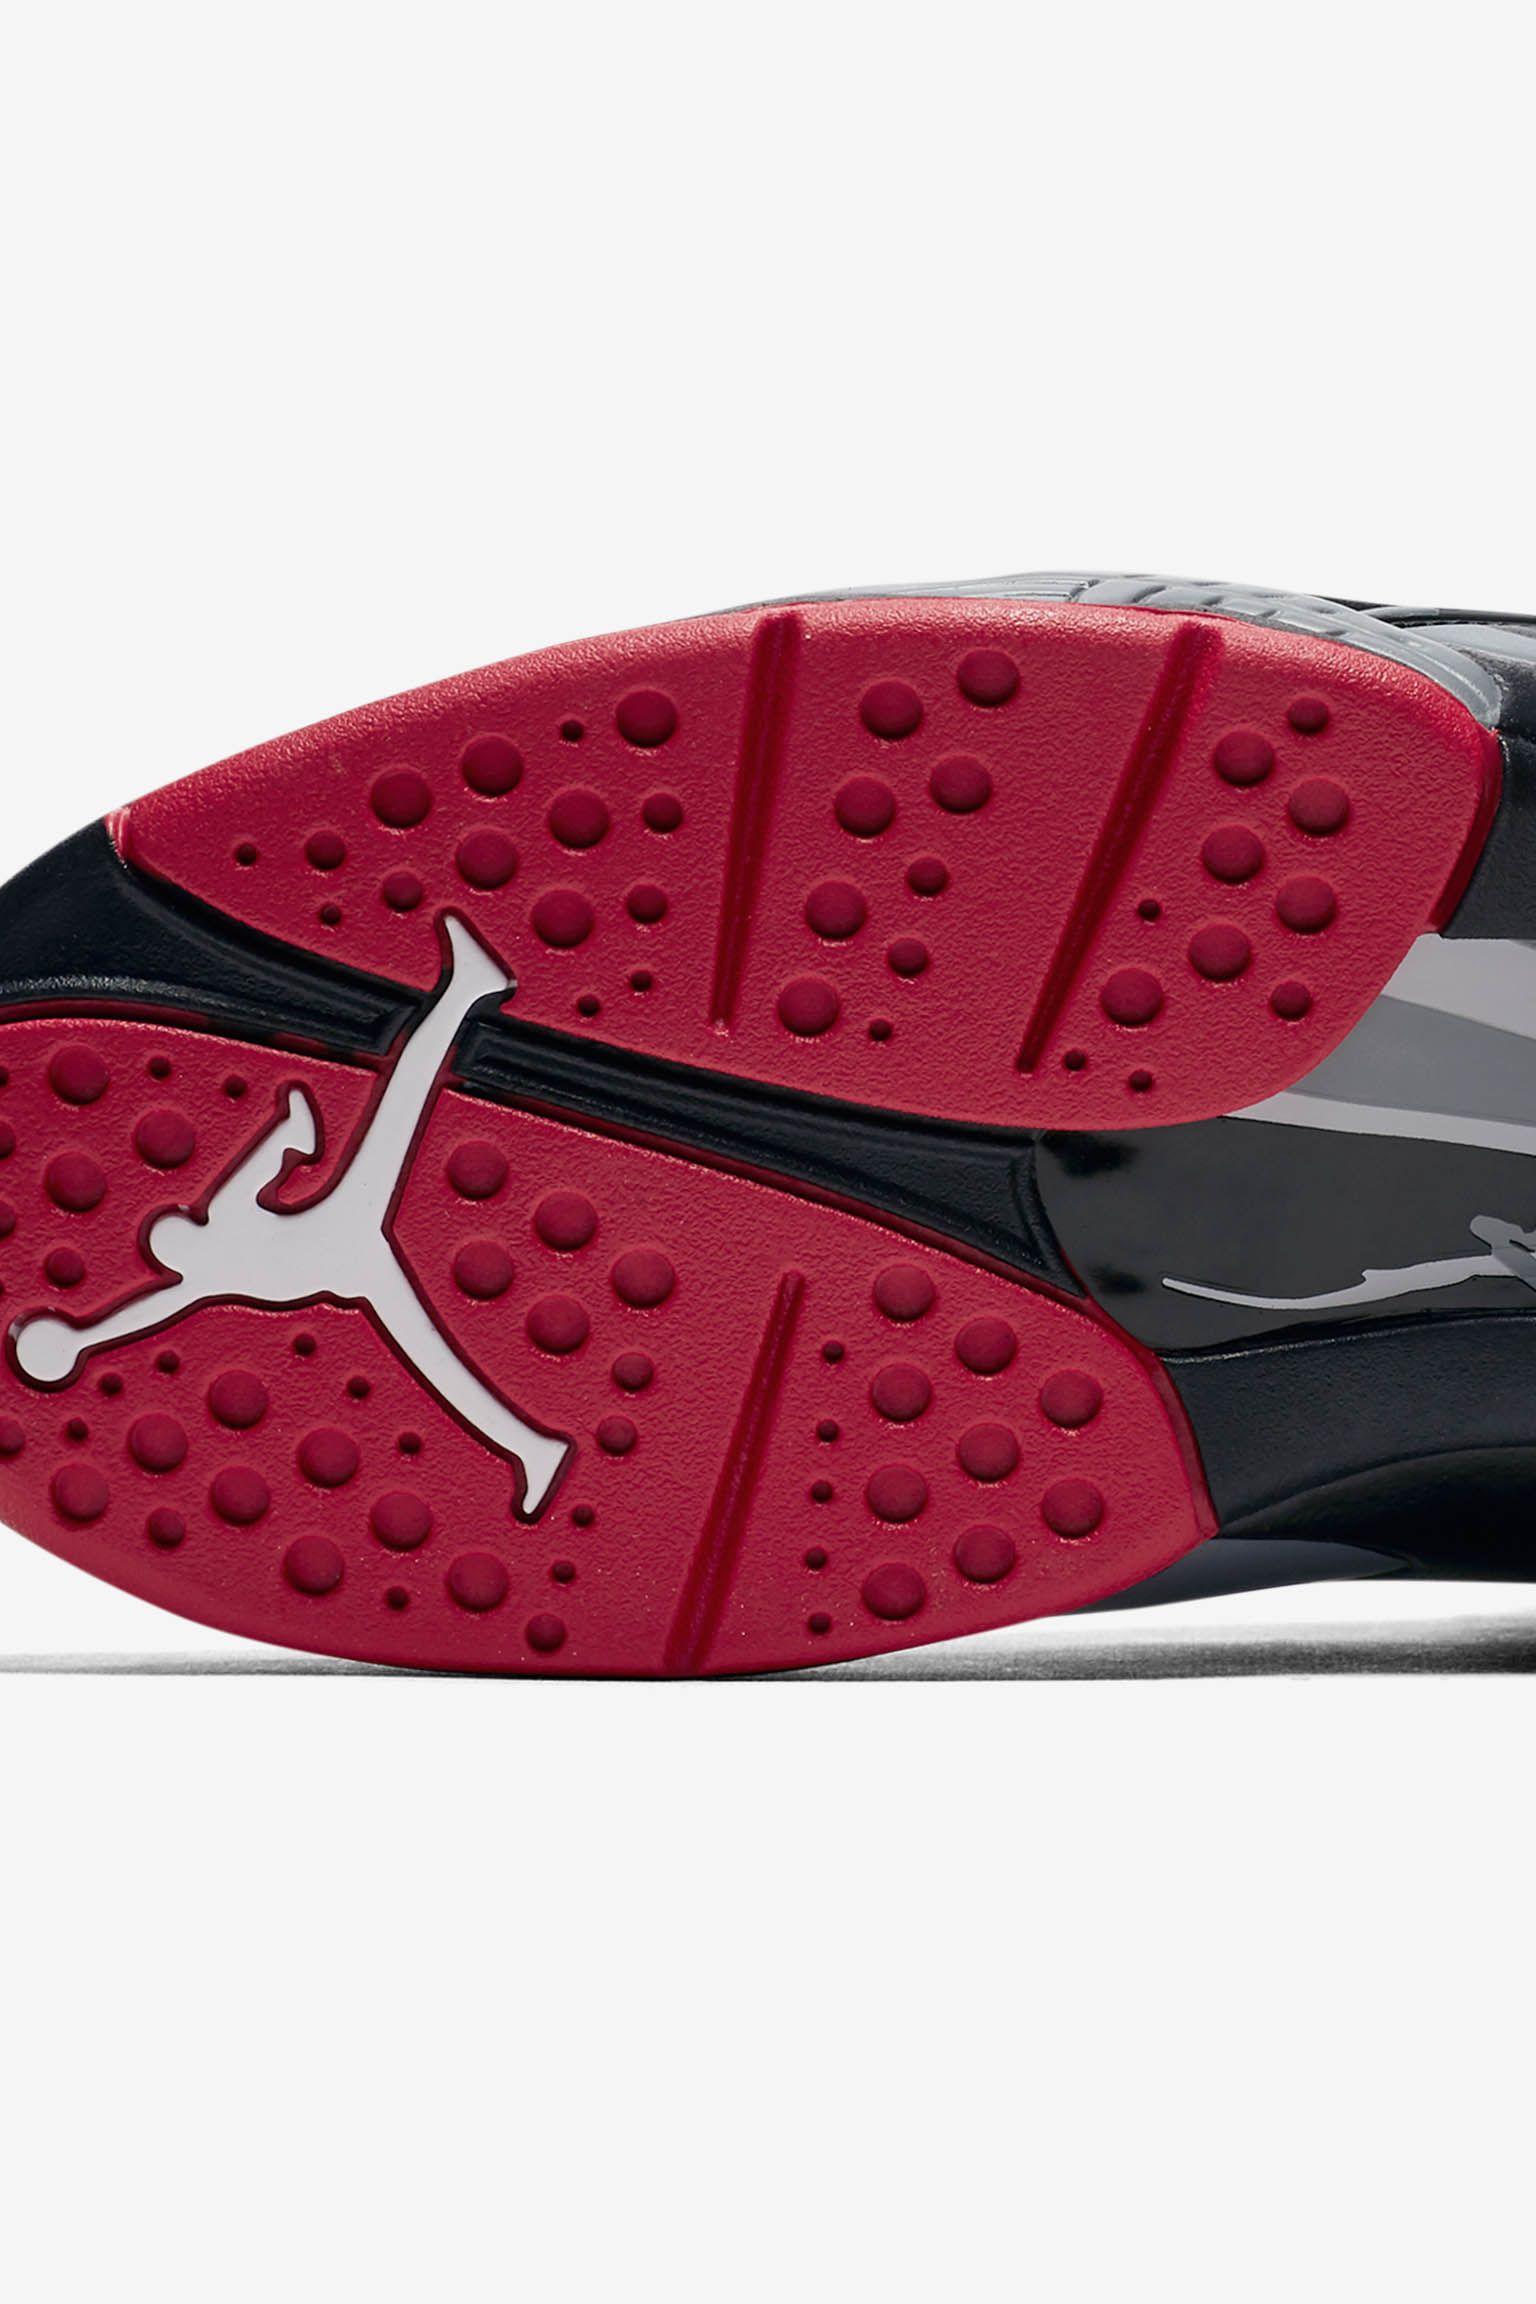 c37ac7780ad Air Jordan 8 Retro  Black  amp  Gym Red  Release Date. Nike+ Launch GB